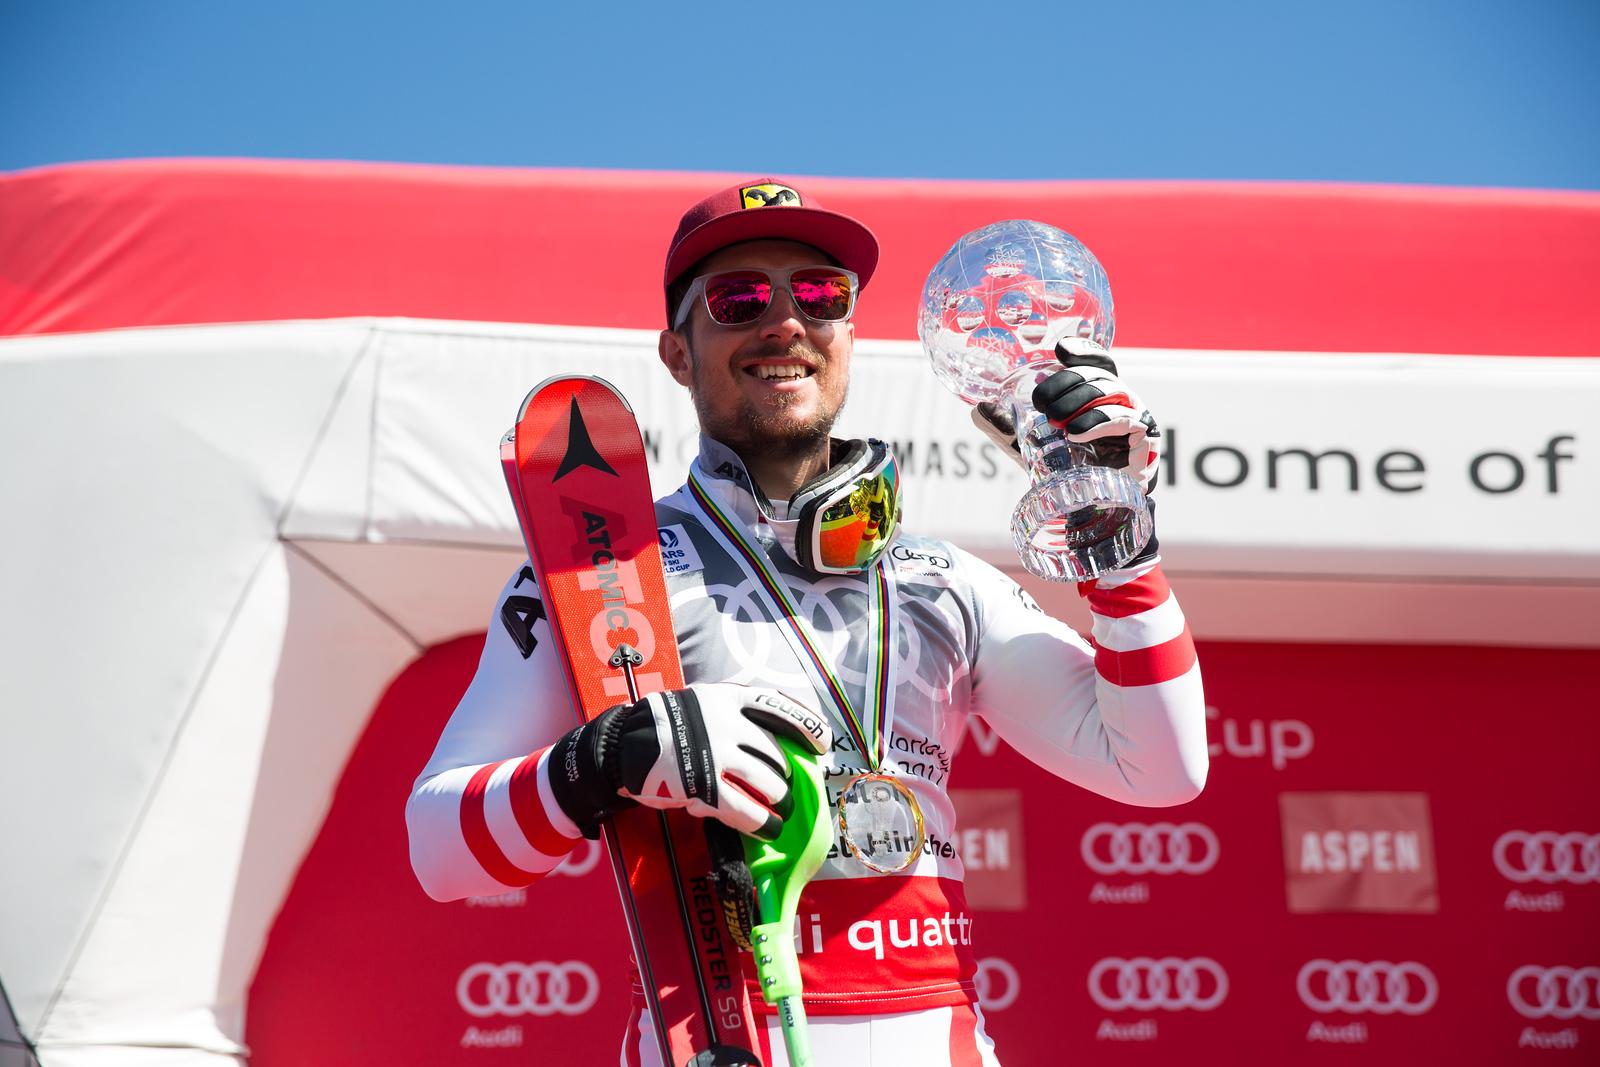 Marcel Hirscher Slalom Overall Globe 2017 Audi FIS Ski World Cup finals in Aspen, CO. Photo: U.S. Ski Team